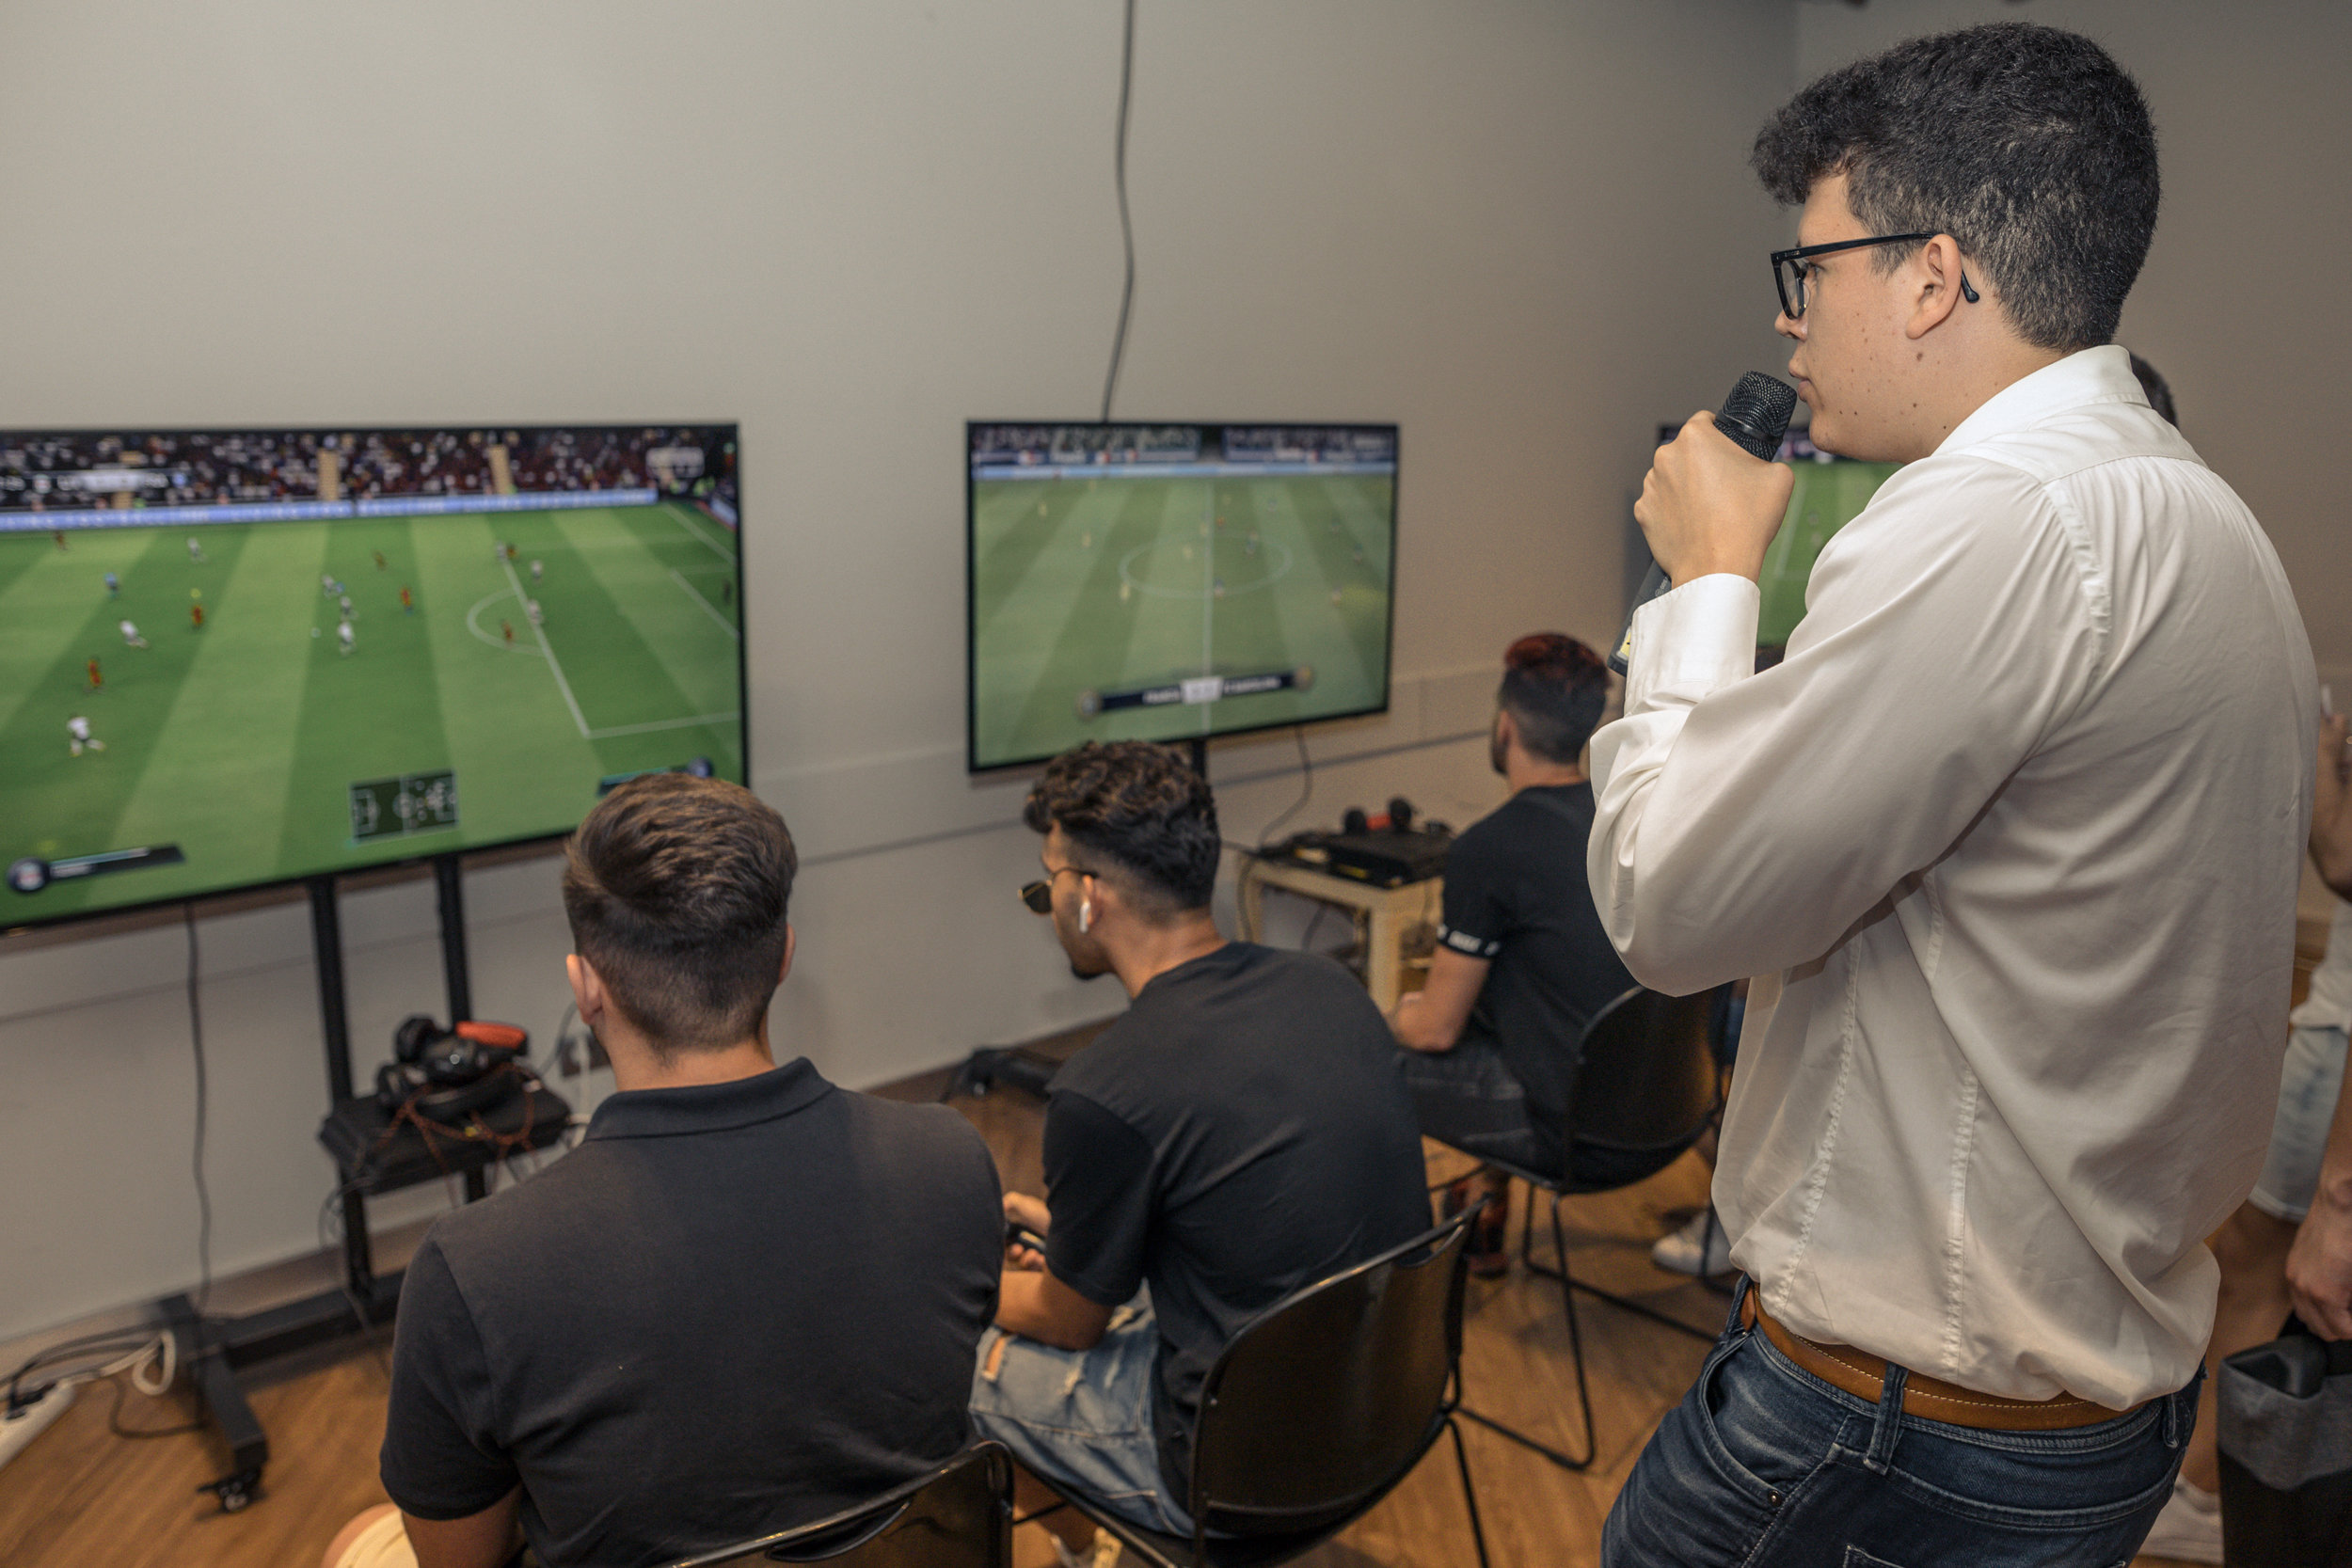 Concurso_FIFA_FNAC_07-2019-10.jpg